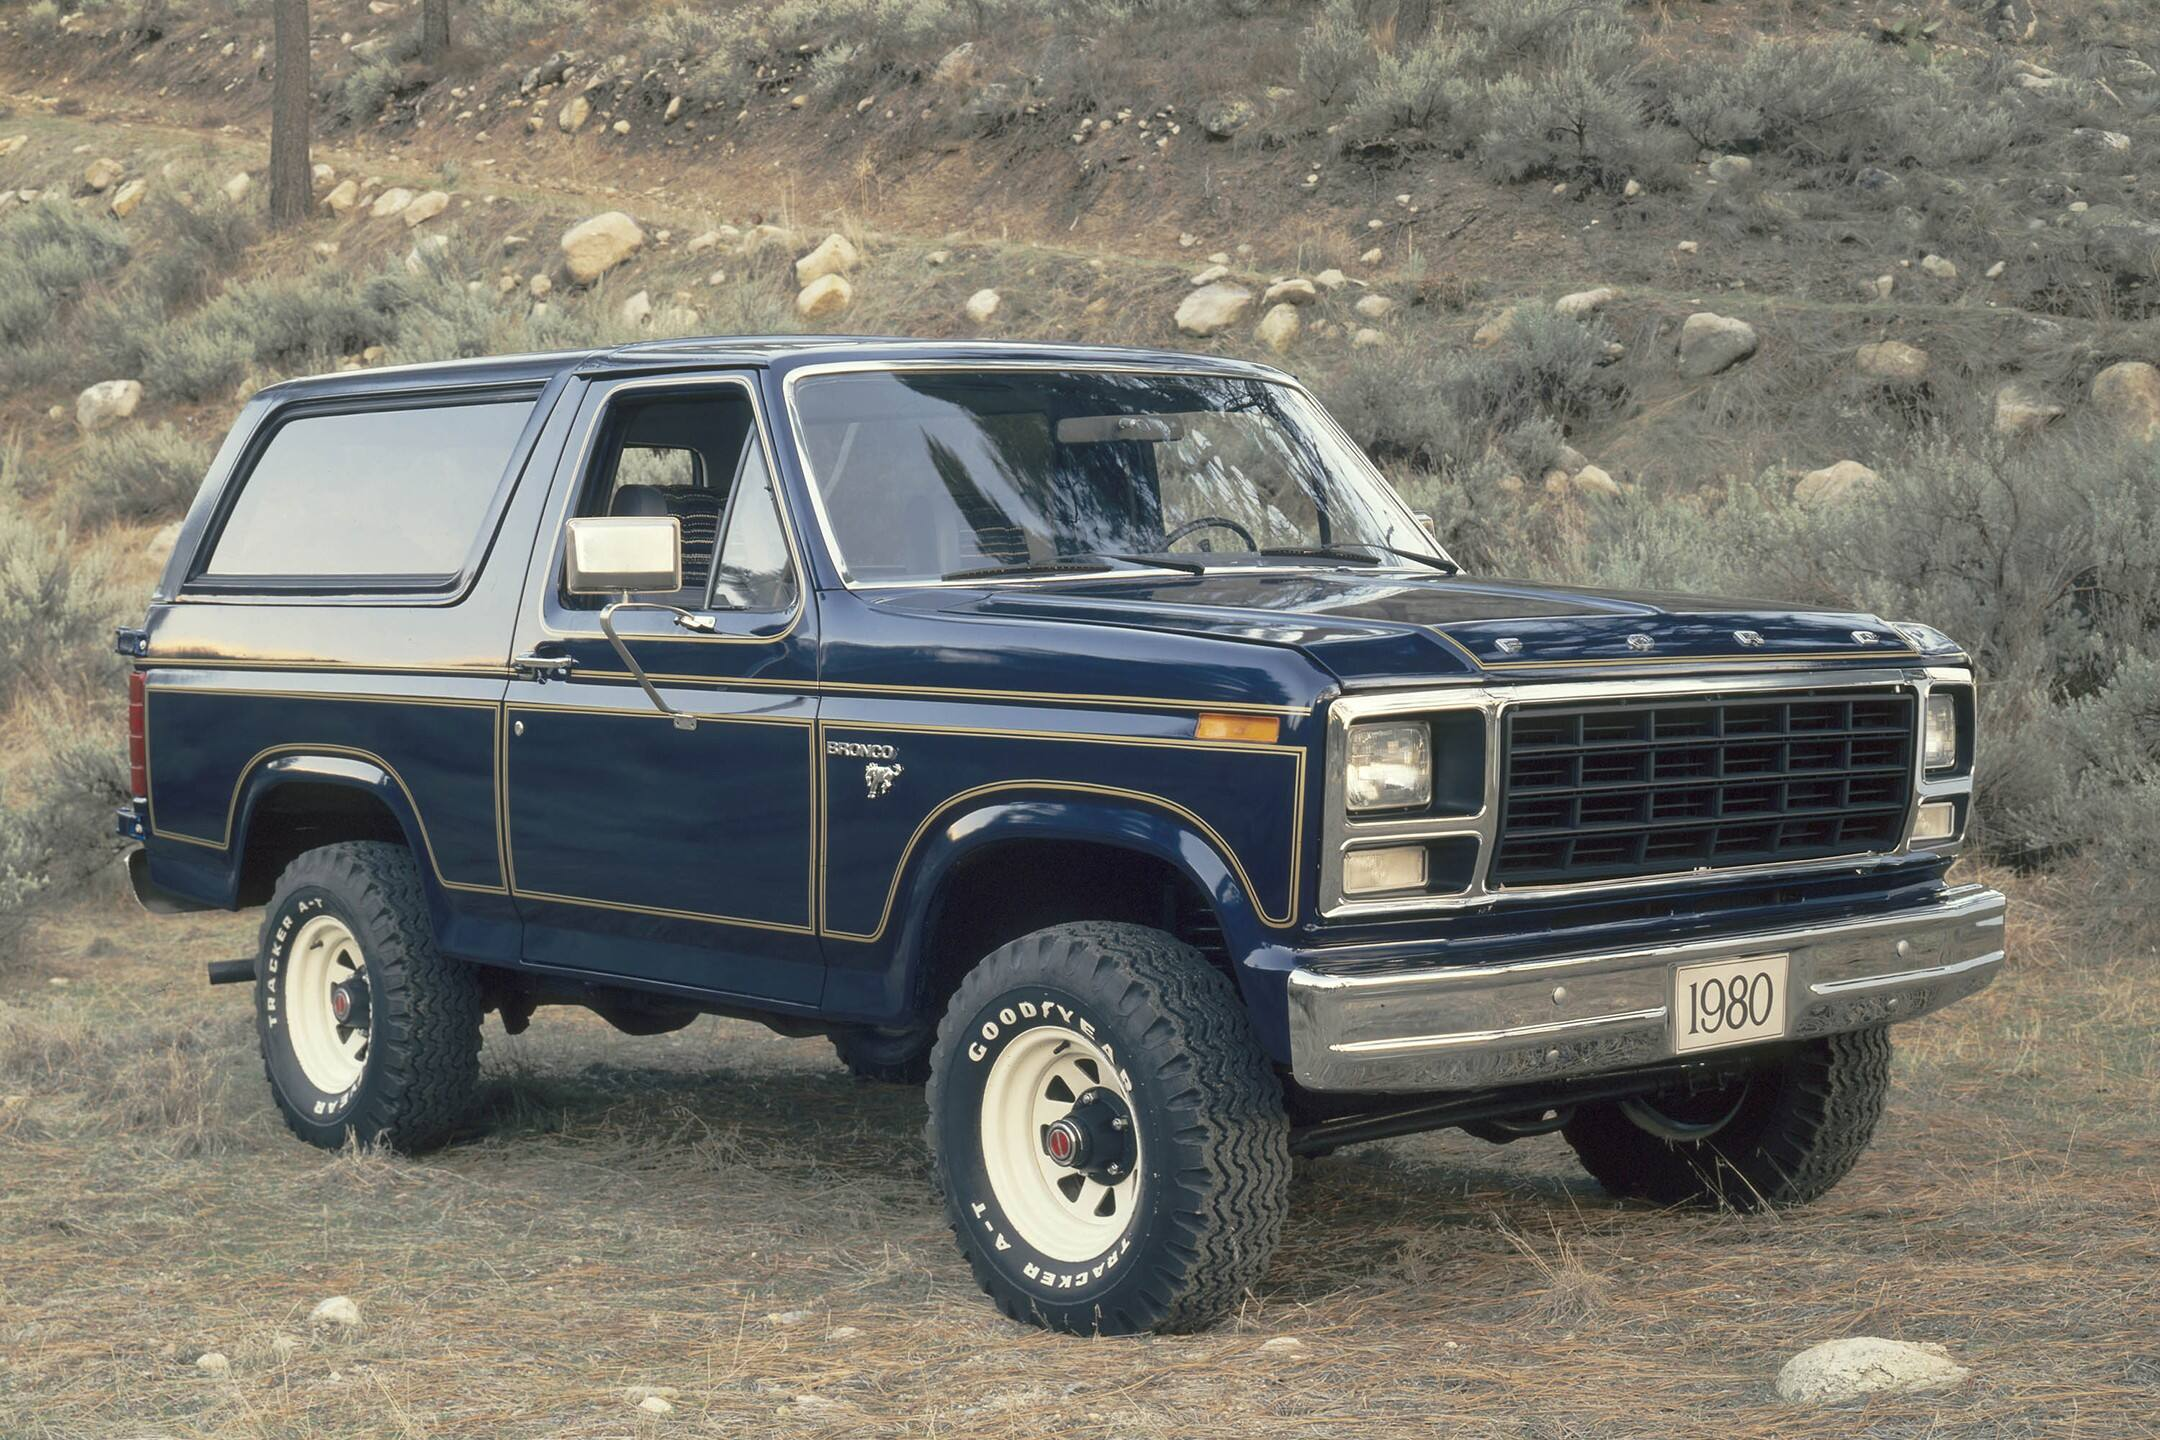 2021 Ford Bronco 2 - The RV Atlas